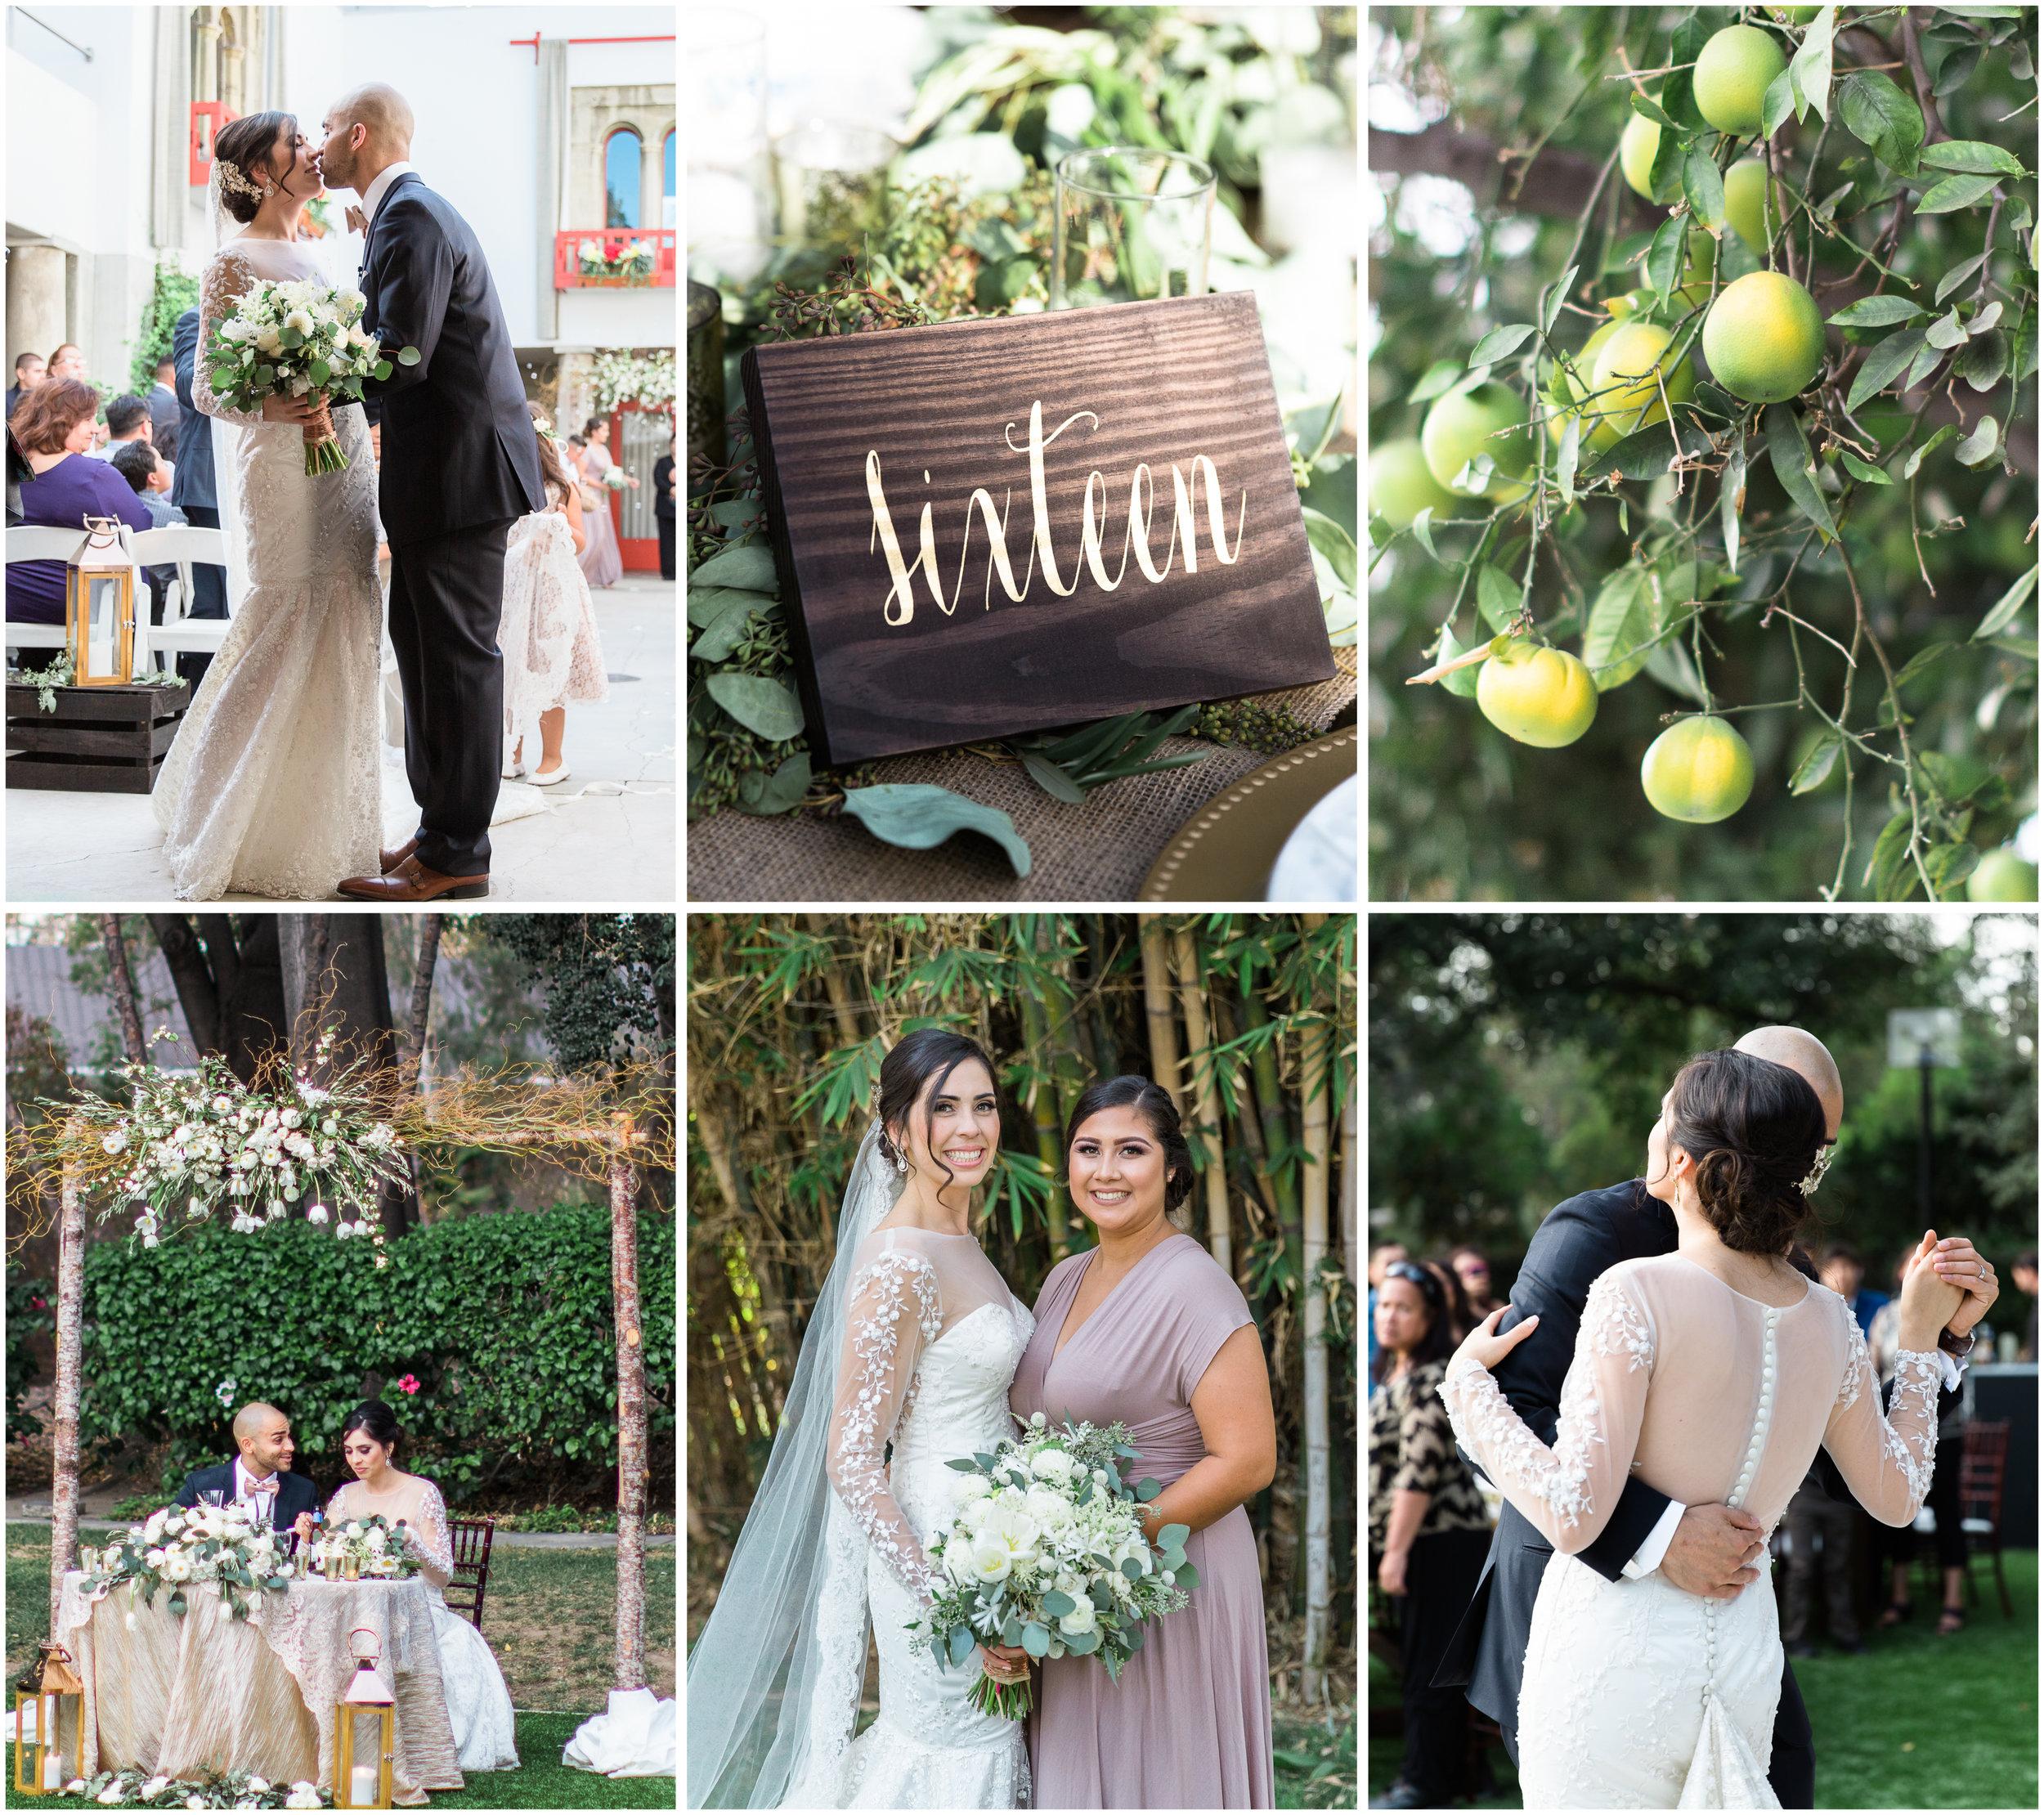 Bonphotage California Wedding Photographer